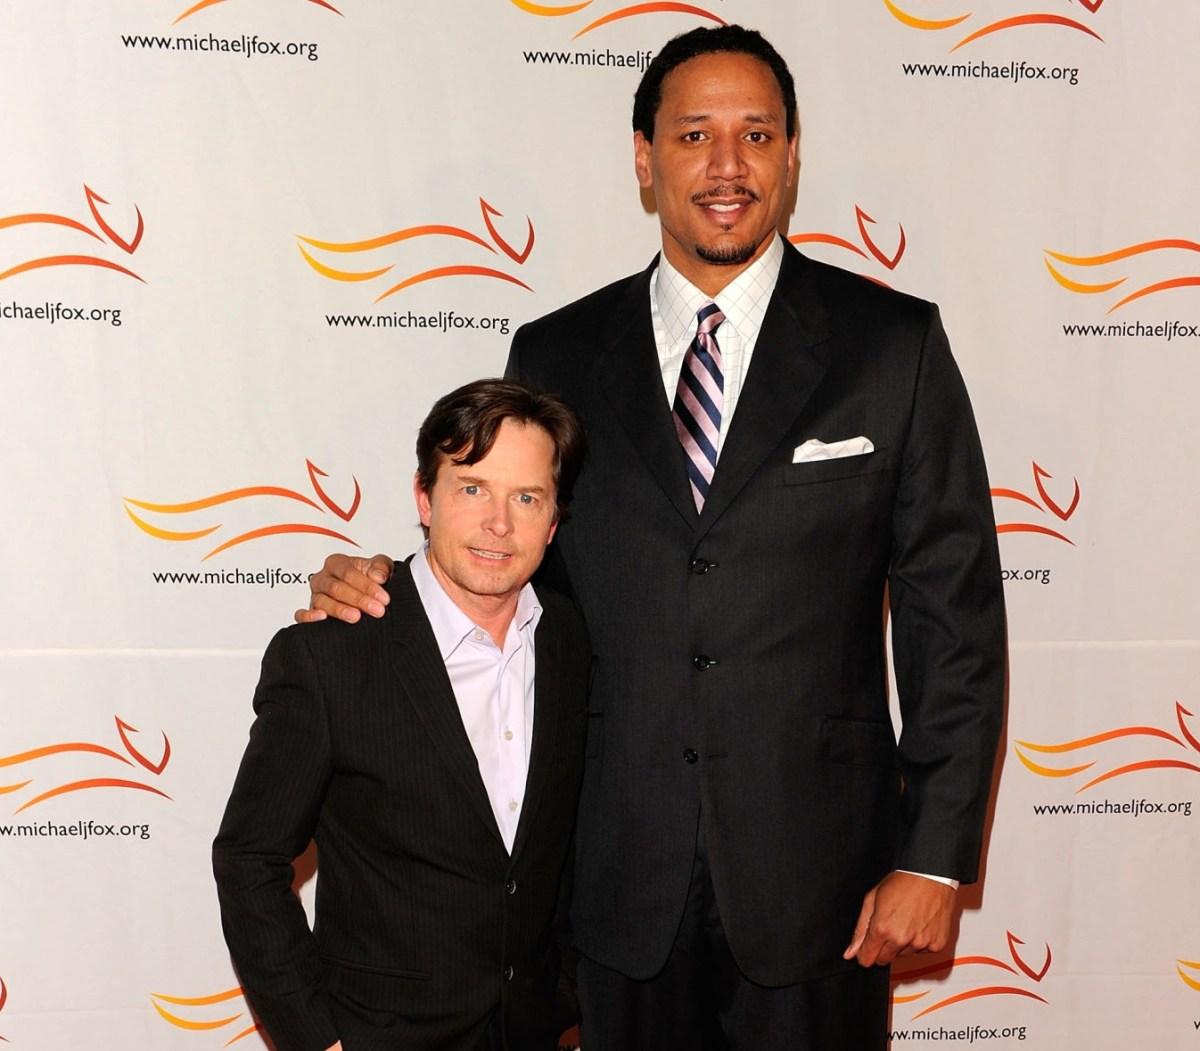 Michael J. Fox and Brian Grant